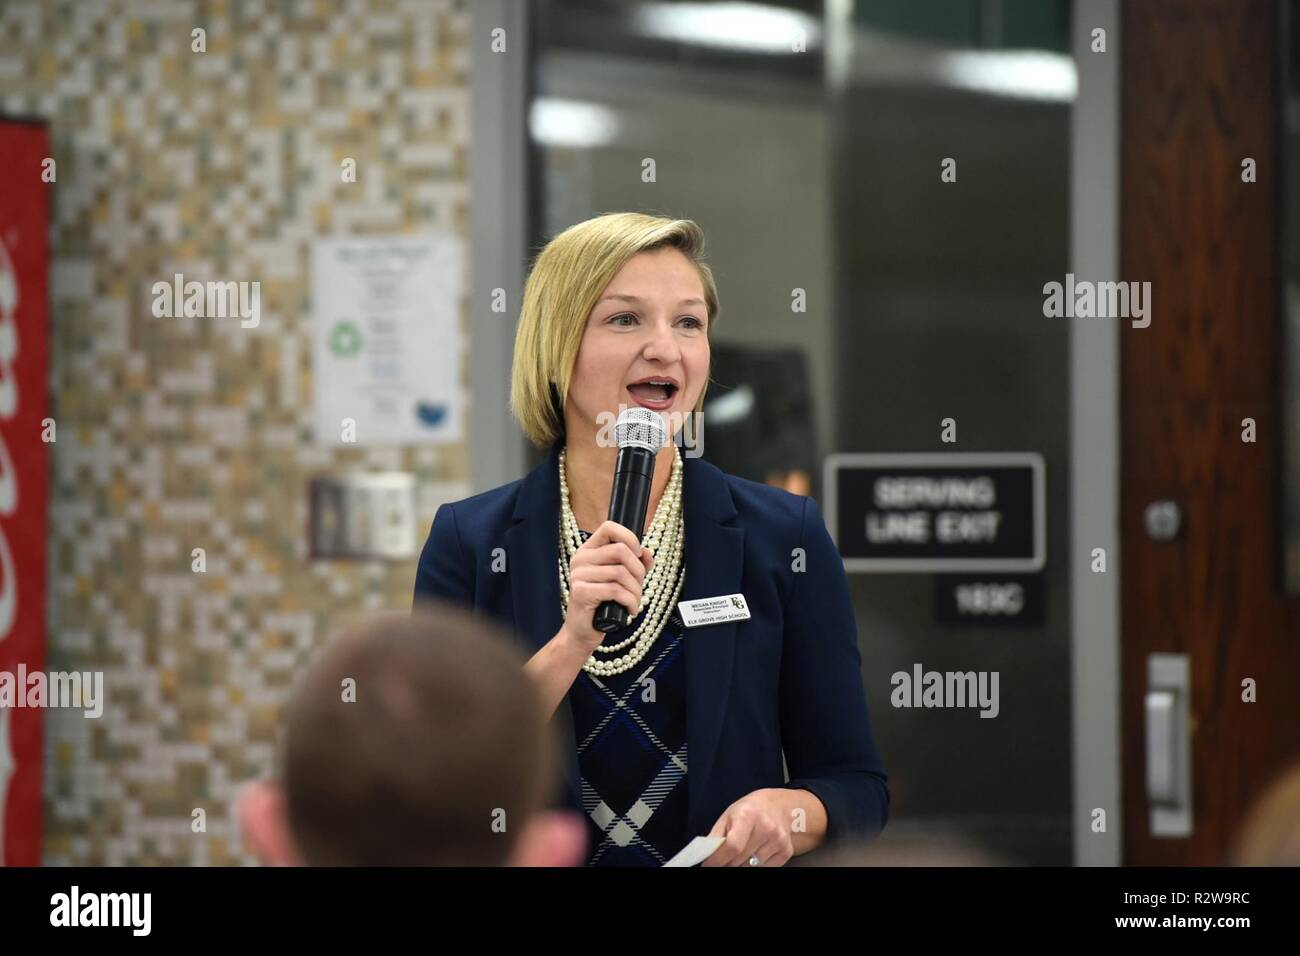 Megan Knight, Associate Principal of Elk Grove High School